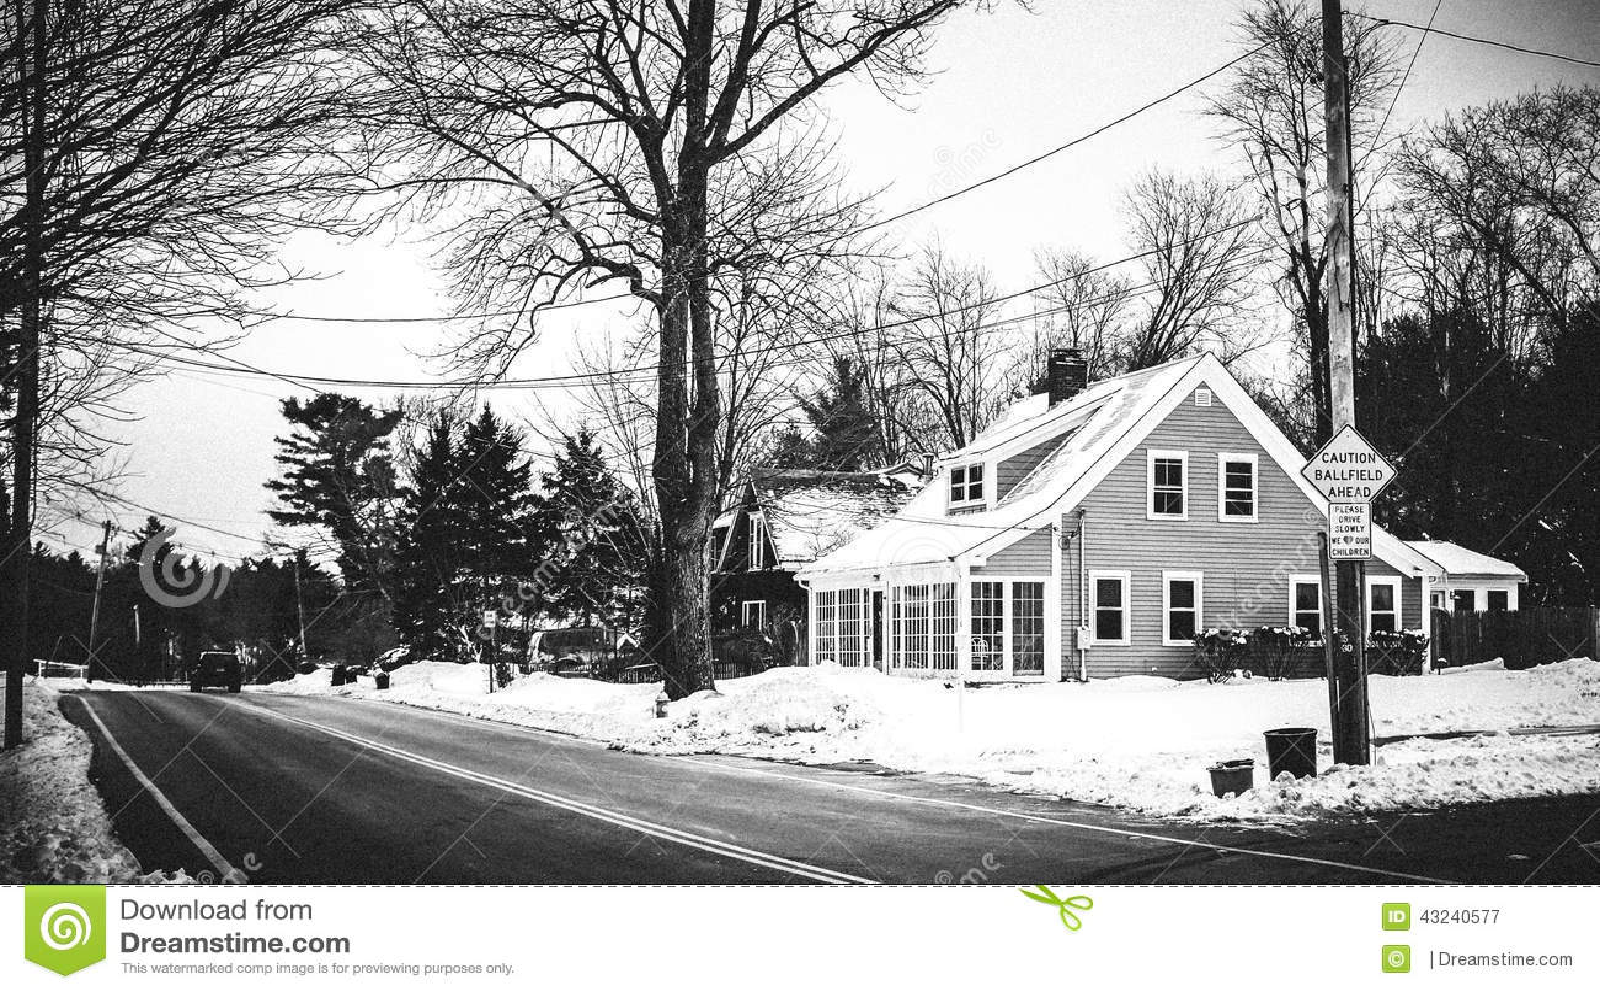 Boston wintery scene in Massachusetts. Abandoned house.